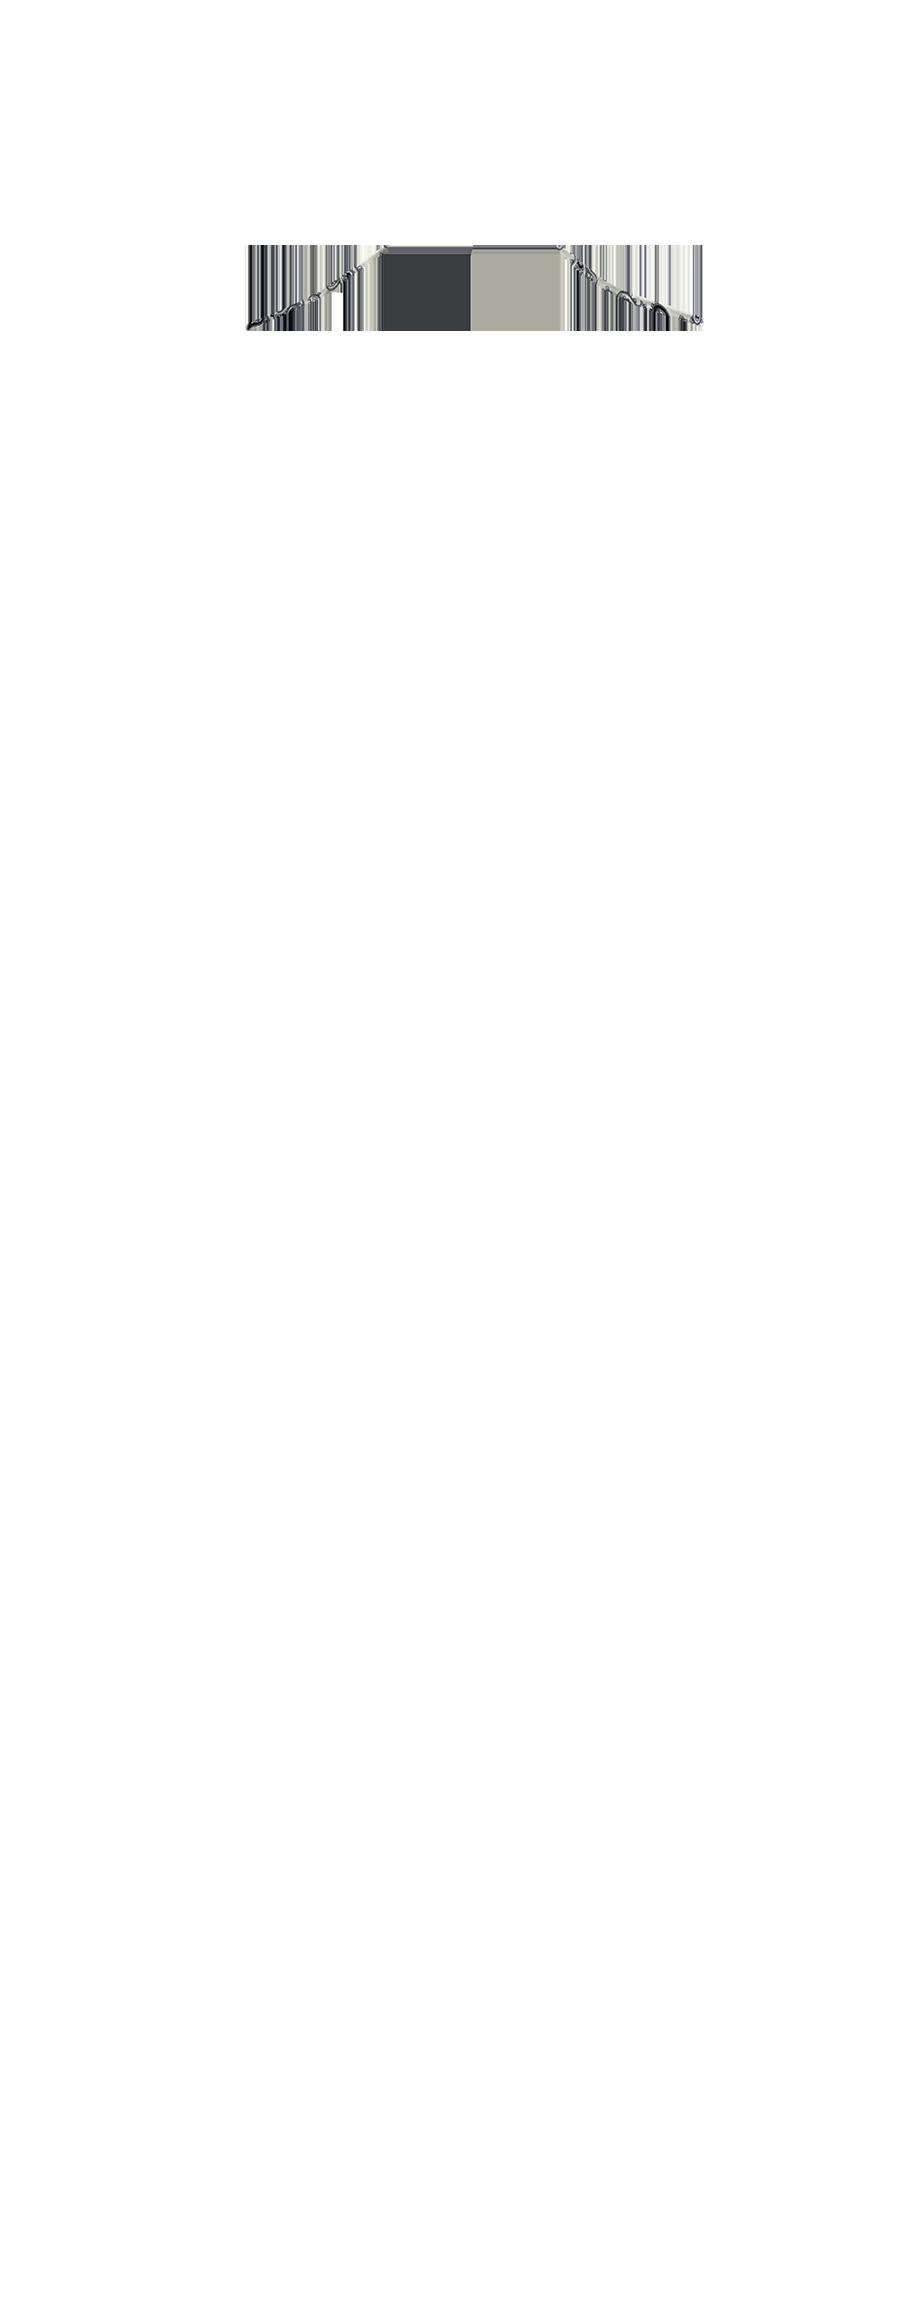 NEFL-19